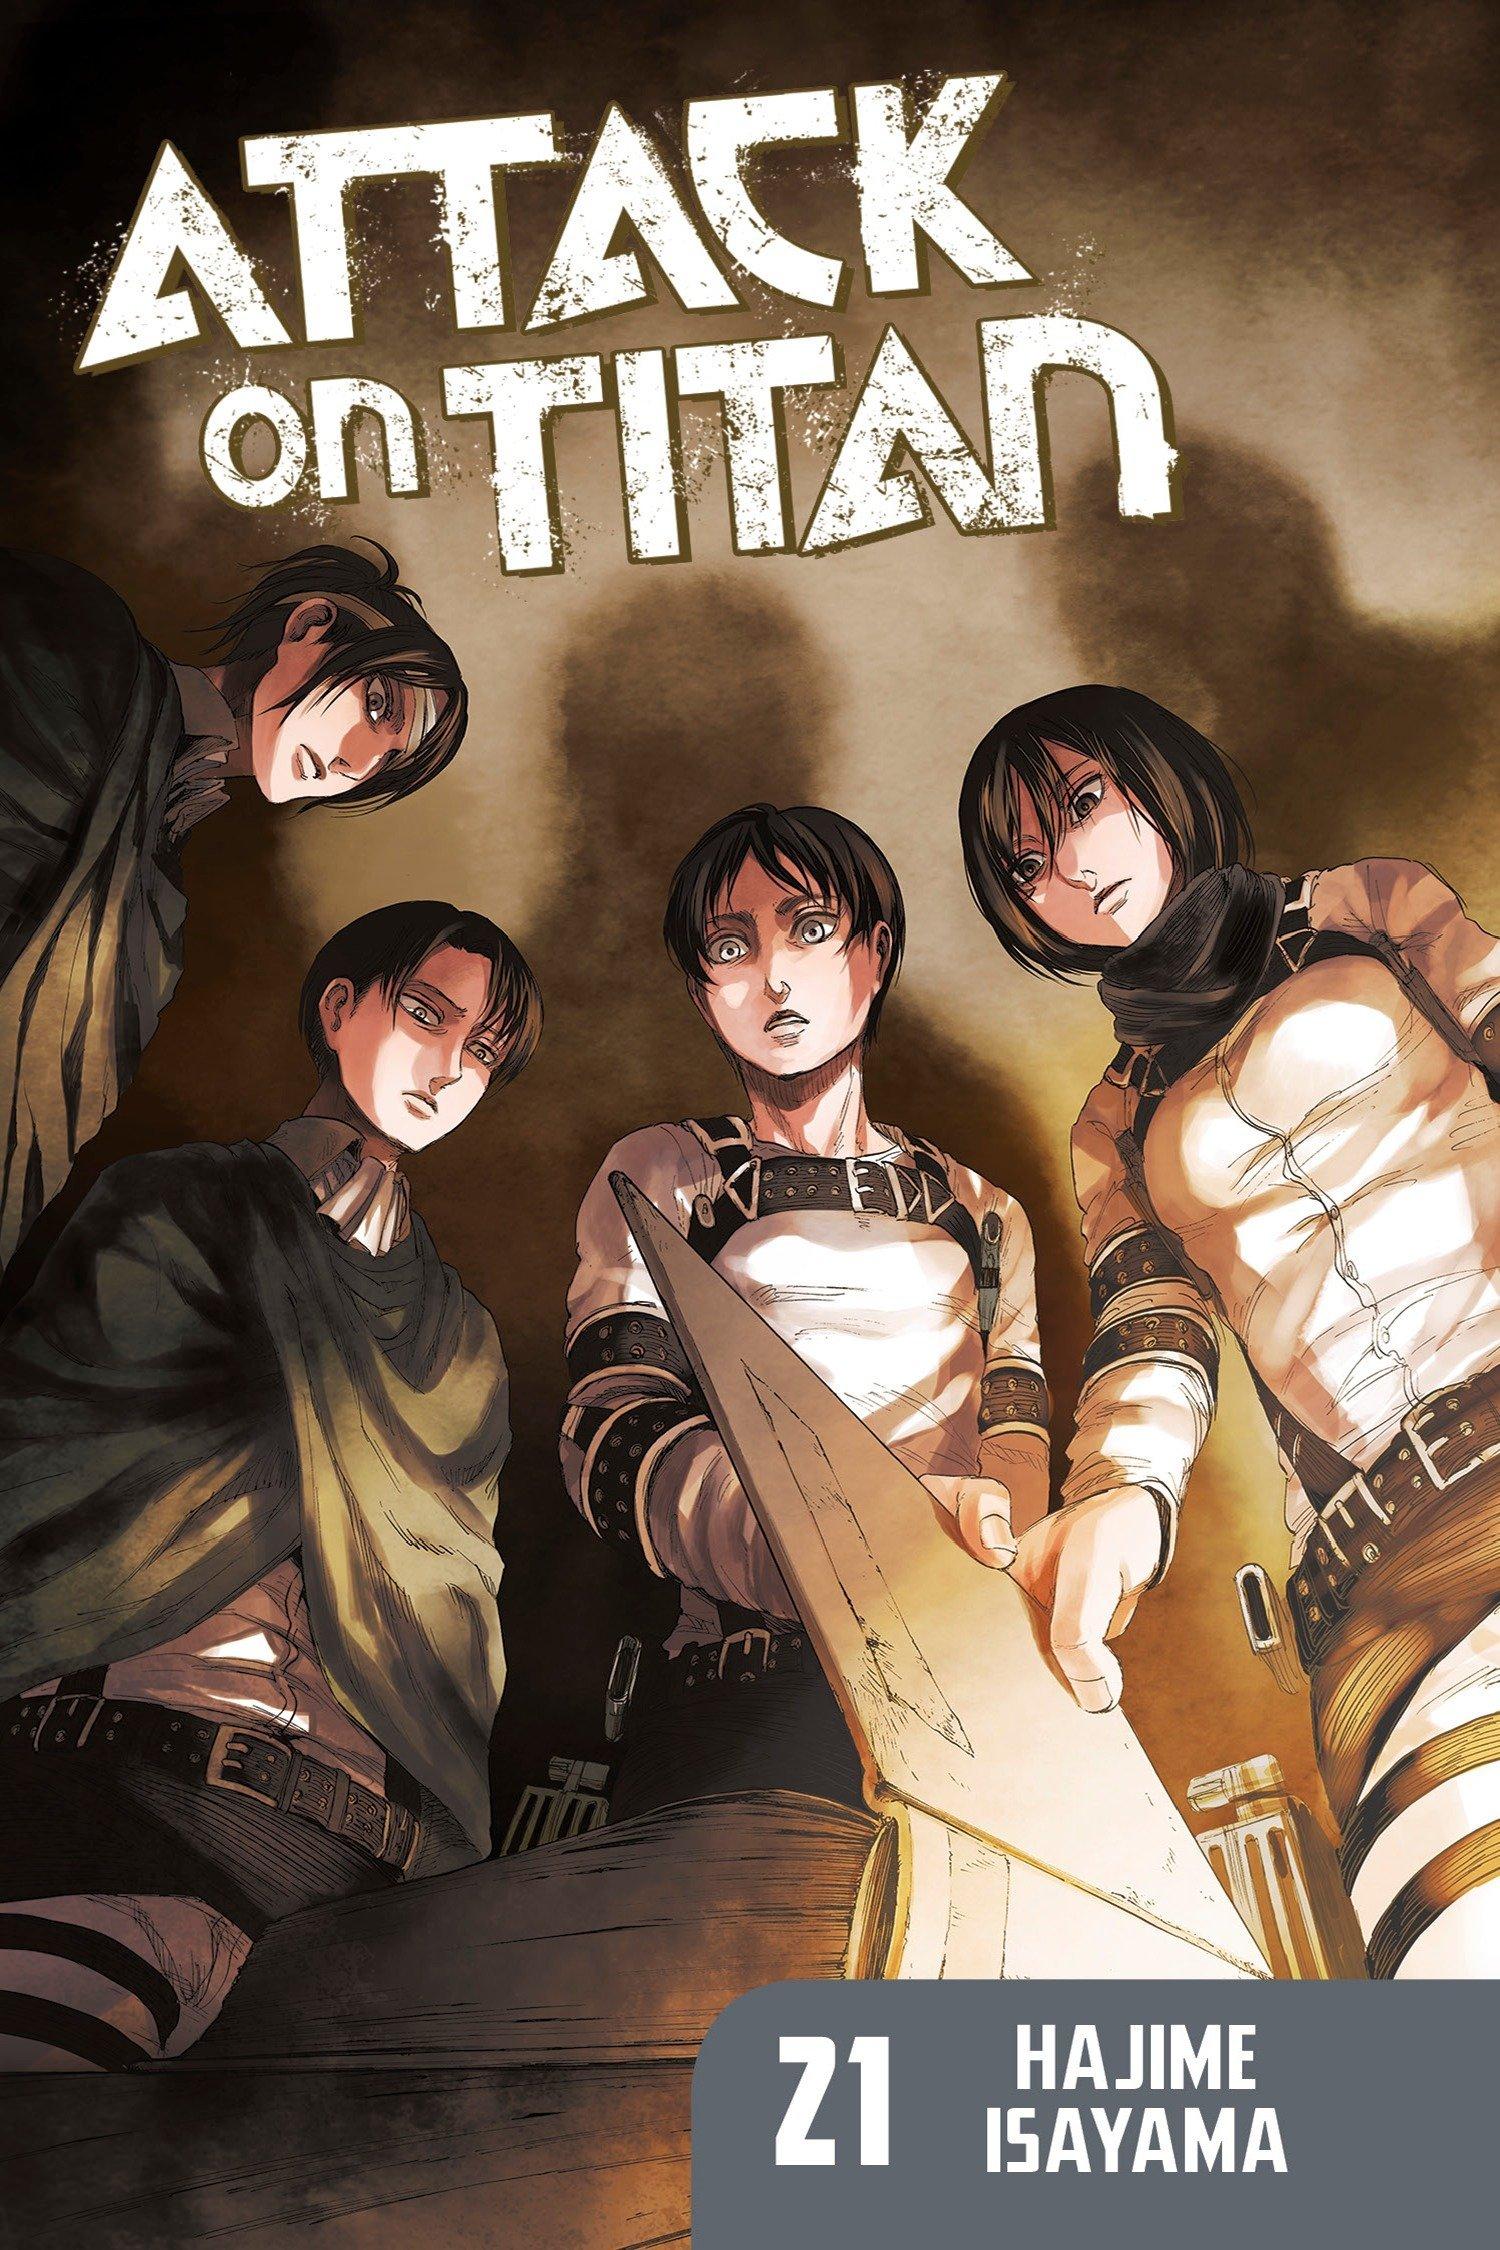 Attack on Titan 21 (Inglese) Copertina flessibile – 20 apr 2017 Hajime Isayama Kodansha Comics 1632363275 Comics & Graphic Novels